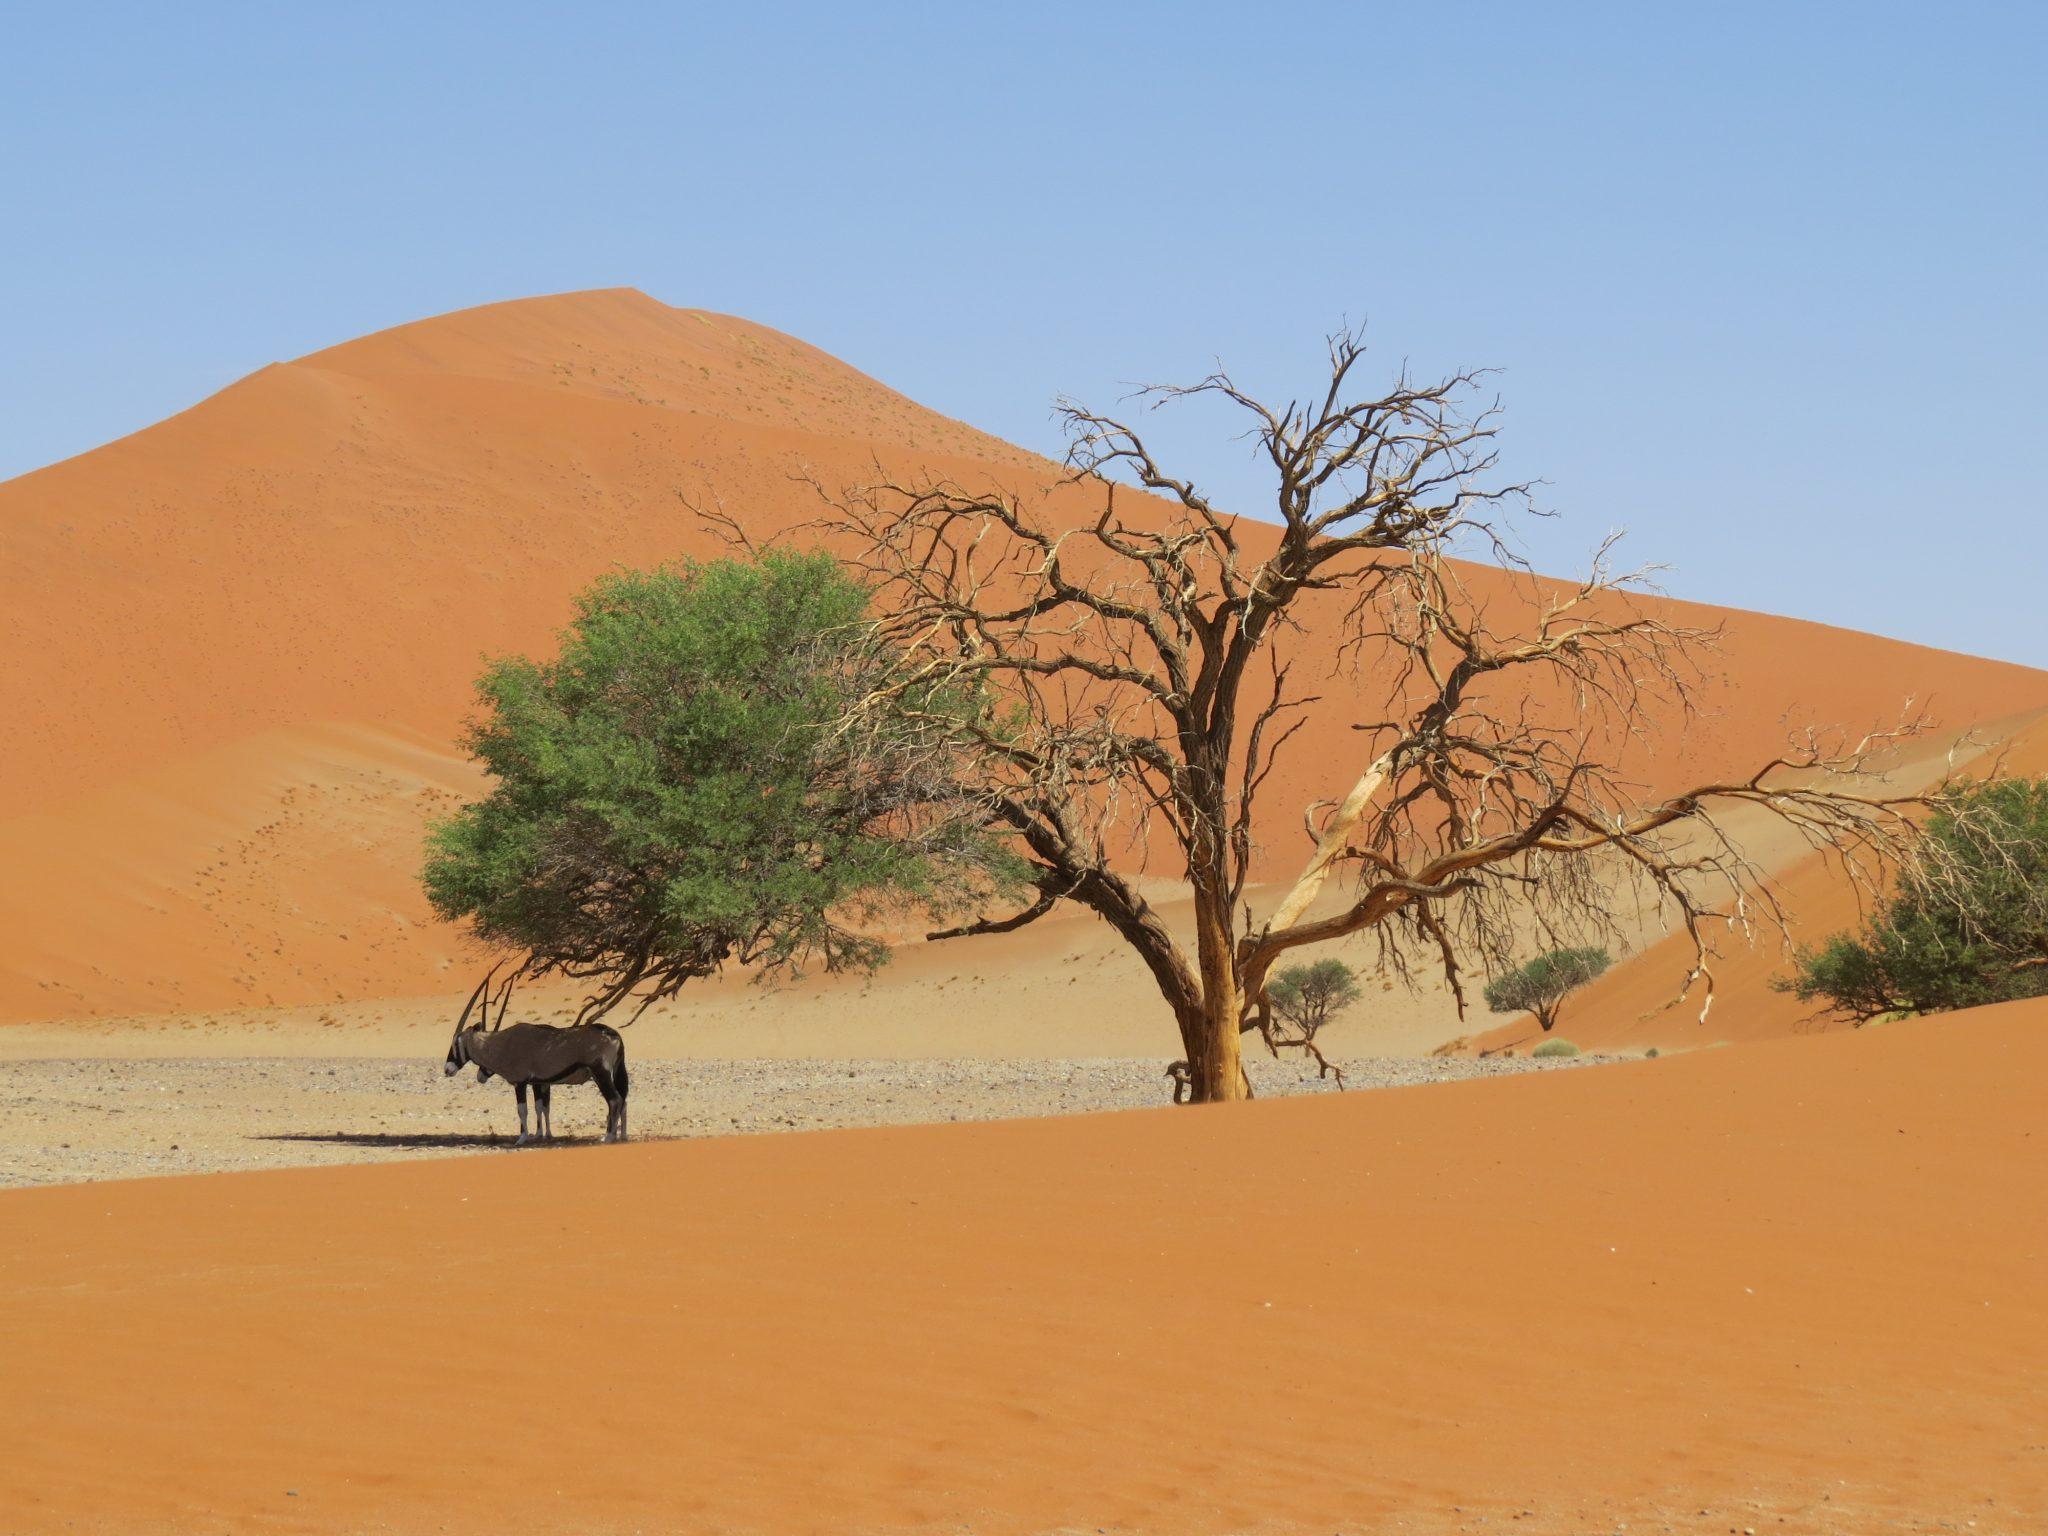 Onze mooiste accommodatie Namibië